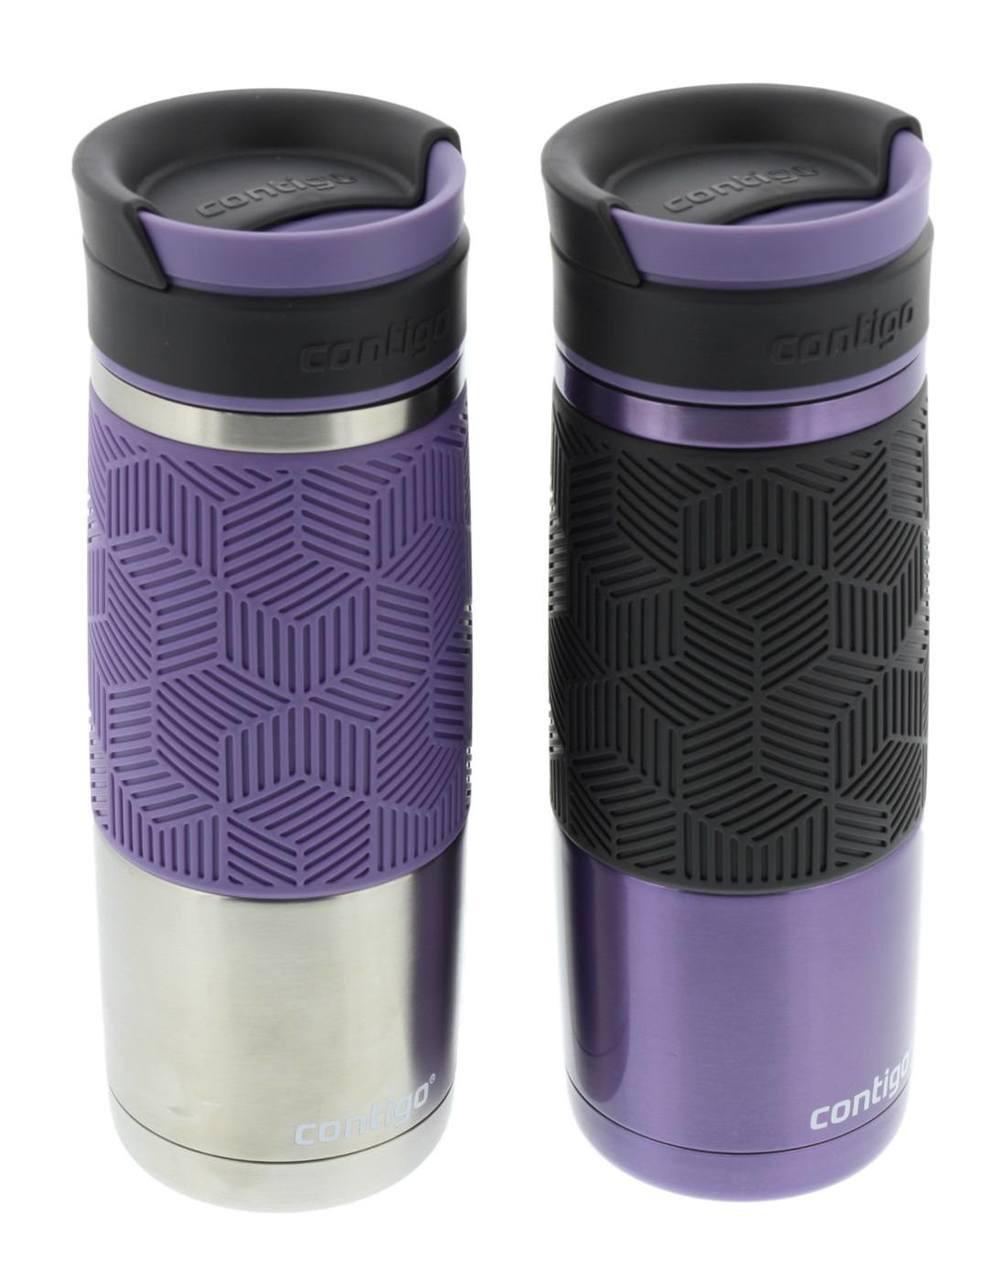 https://d3d71ba2asa5oz.cloudfront.net/23000296/images/contigo-autoseal-transit-travel-mug-stainless-and-violet-2pk-c.jpg